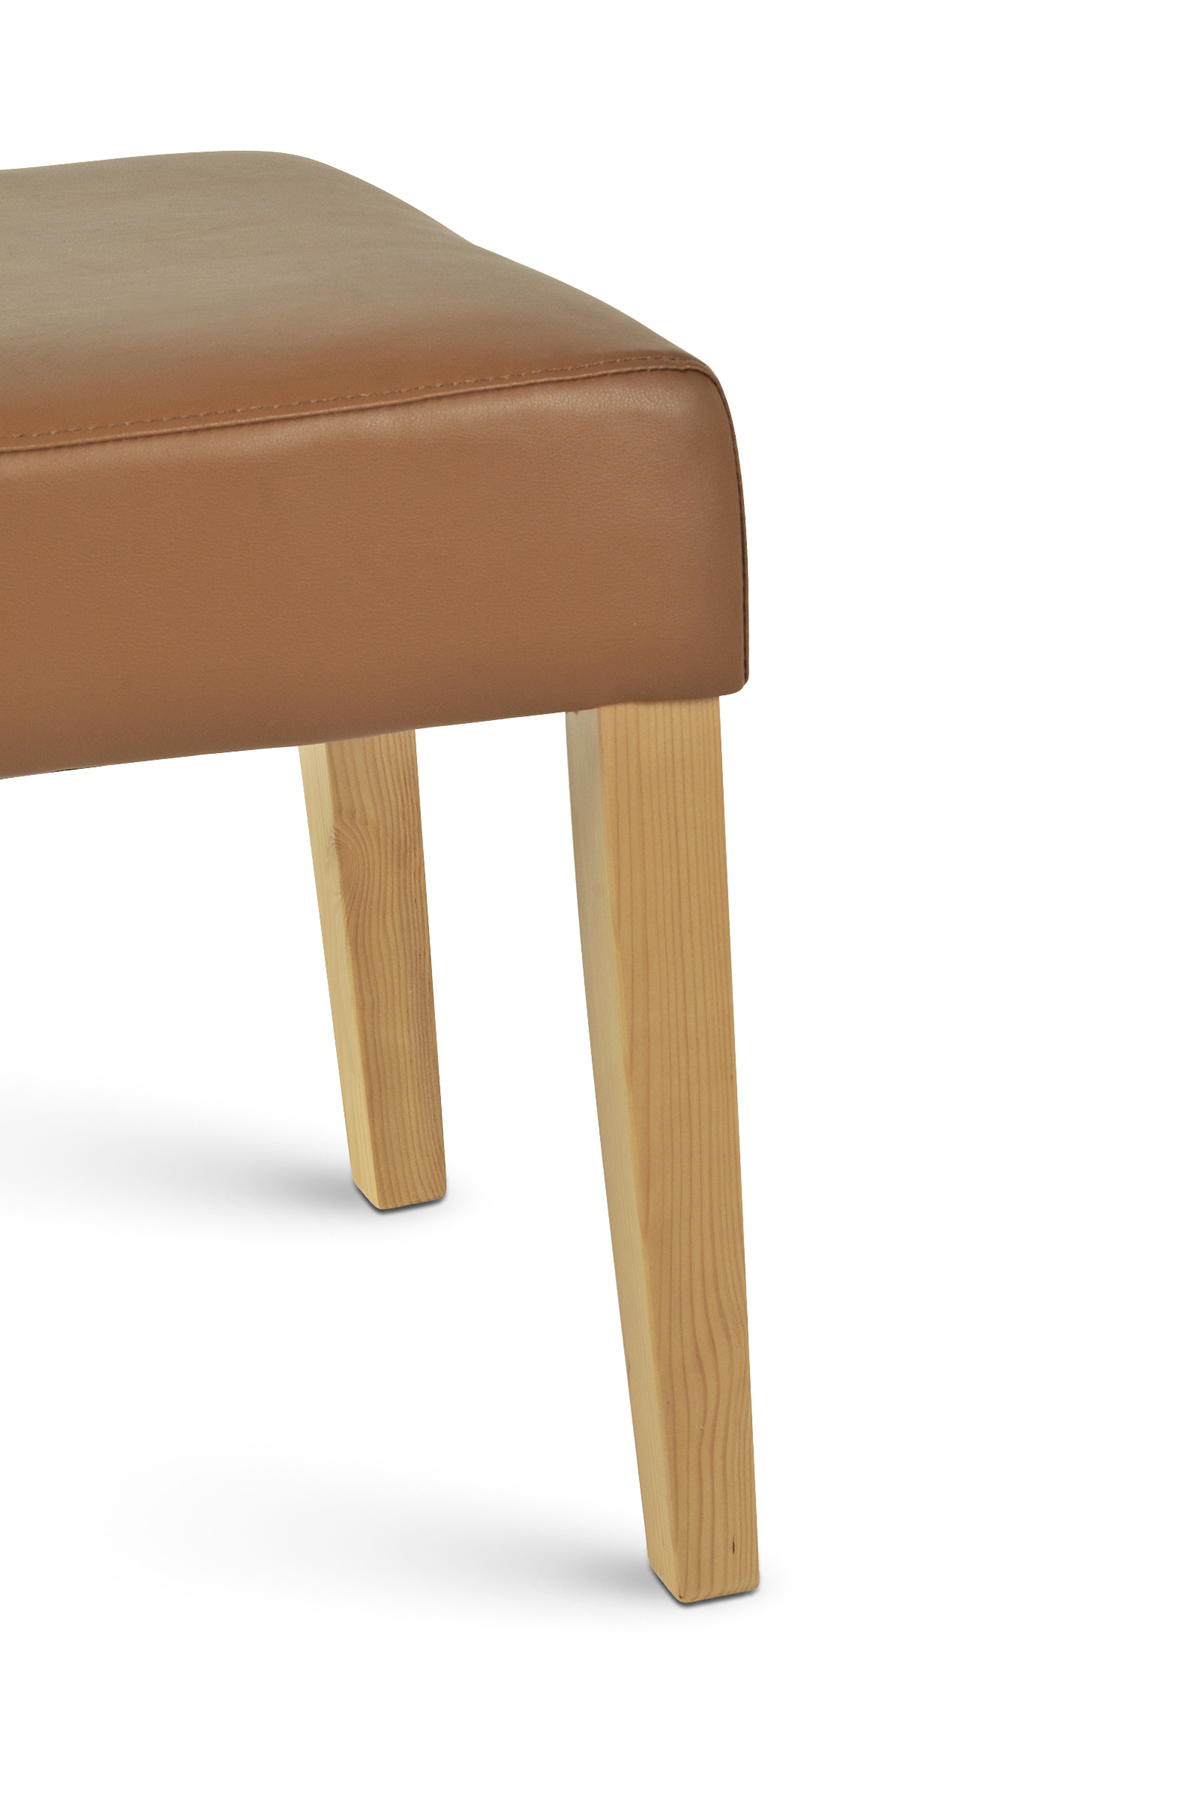 sam polster stuhl cappuccino buche dego g nstig. Black Bedroom Furniture Sets. Home Design Ideas